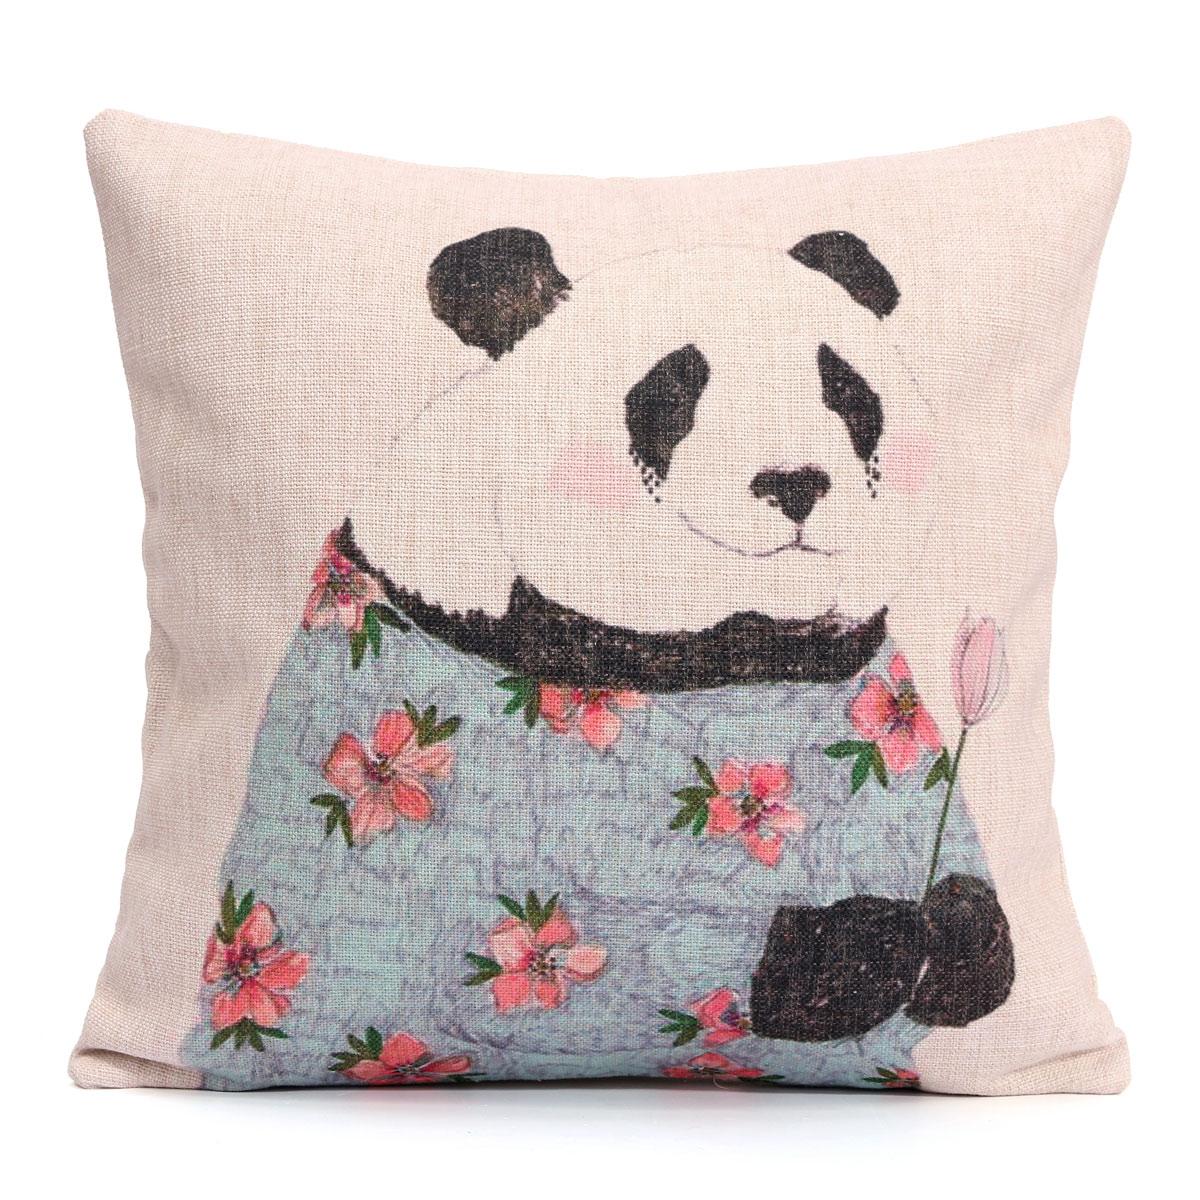 Cotten Linen Panda Animal Cushion Cover Soft Seat Throw Pillow Case Home Decor eBay